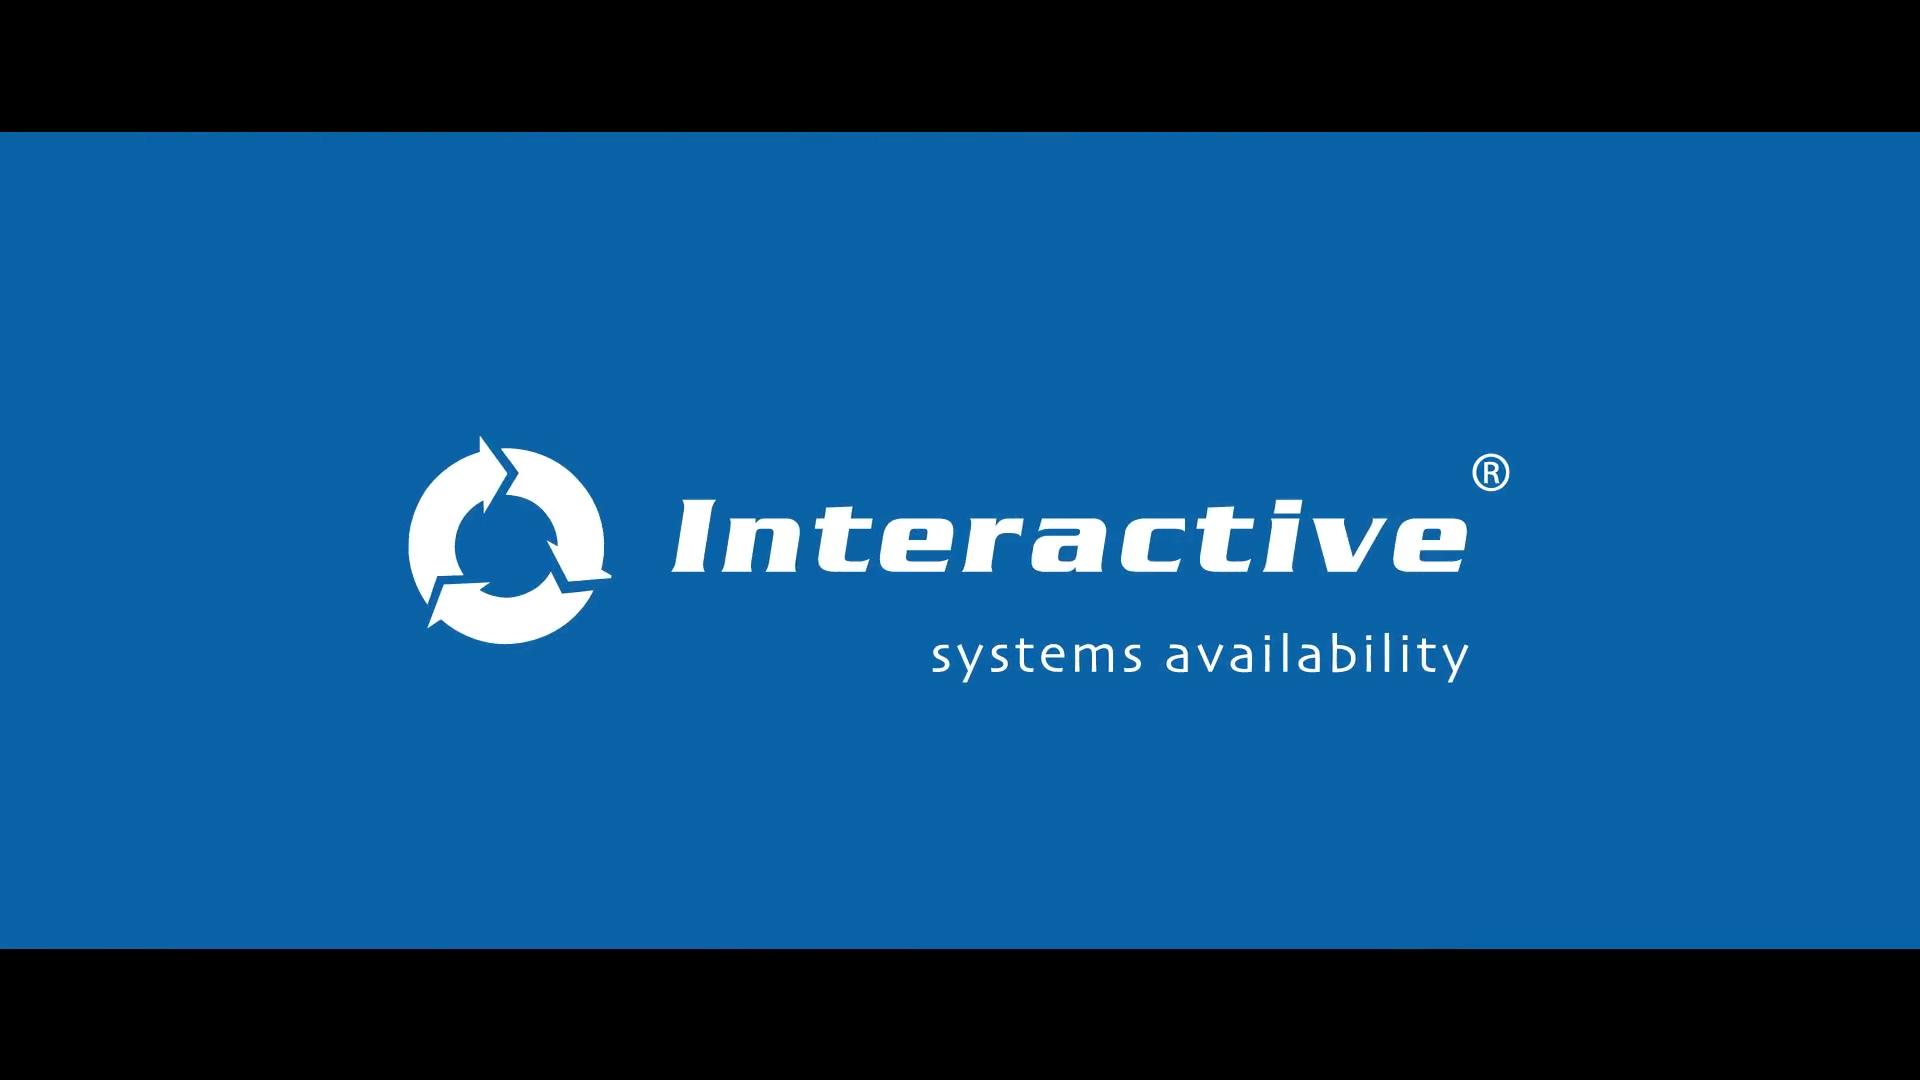 y2mate.com - Interactive for Hardware Maintenance_xCOnJZz8TC8_1080p